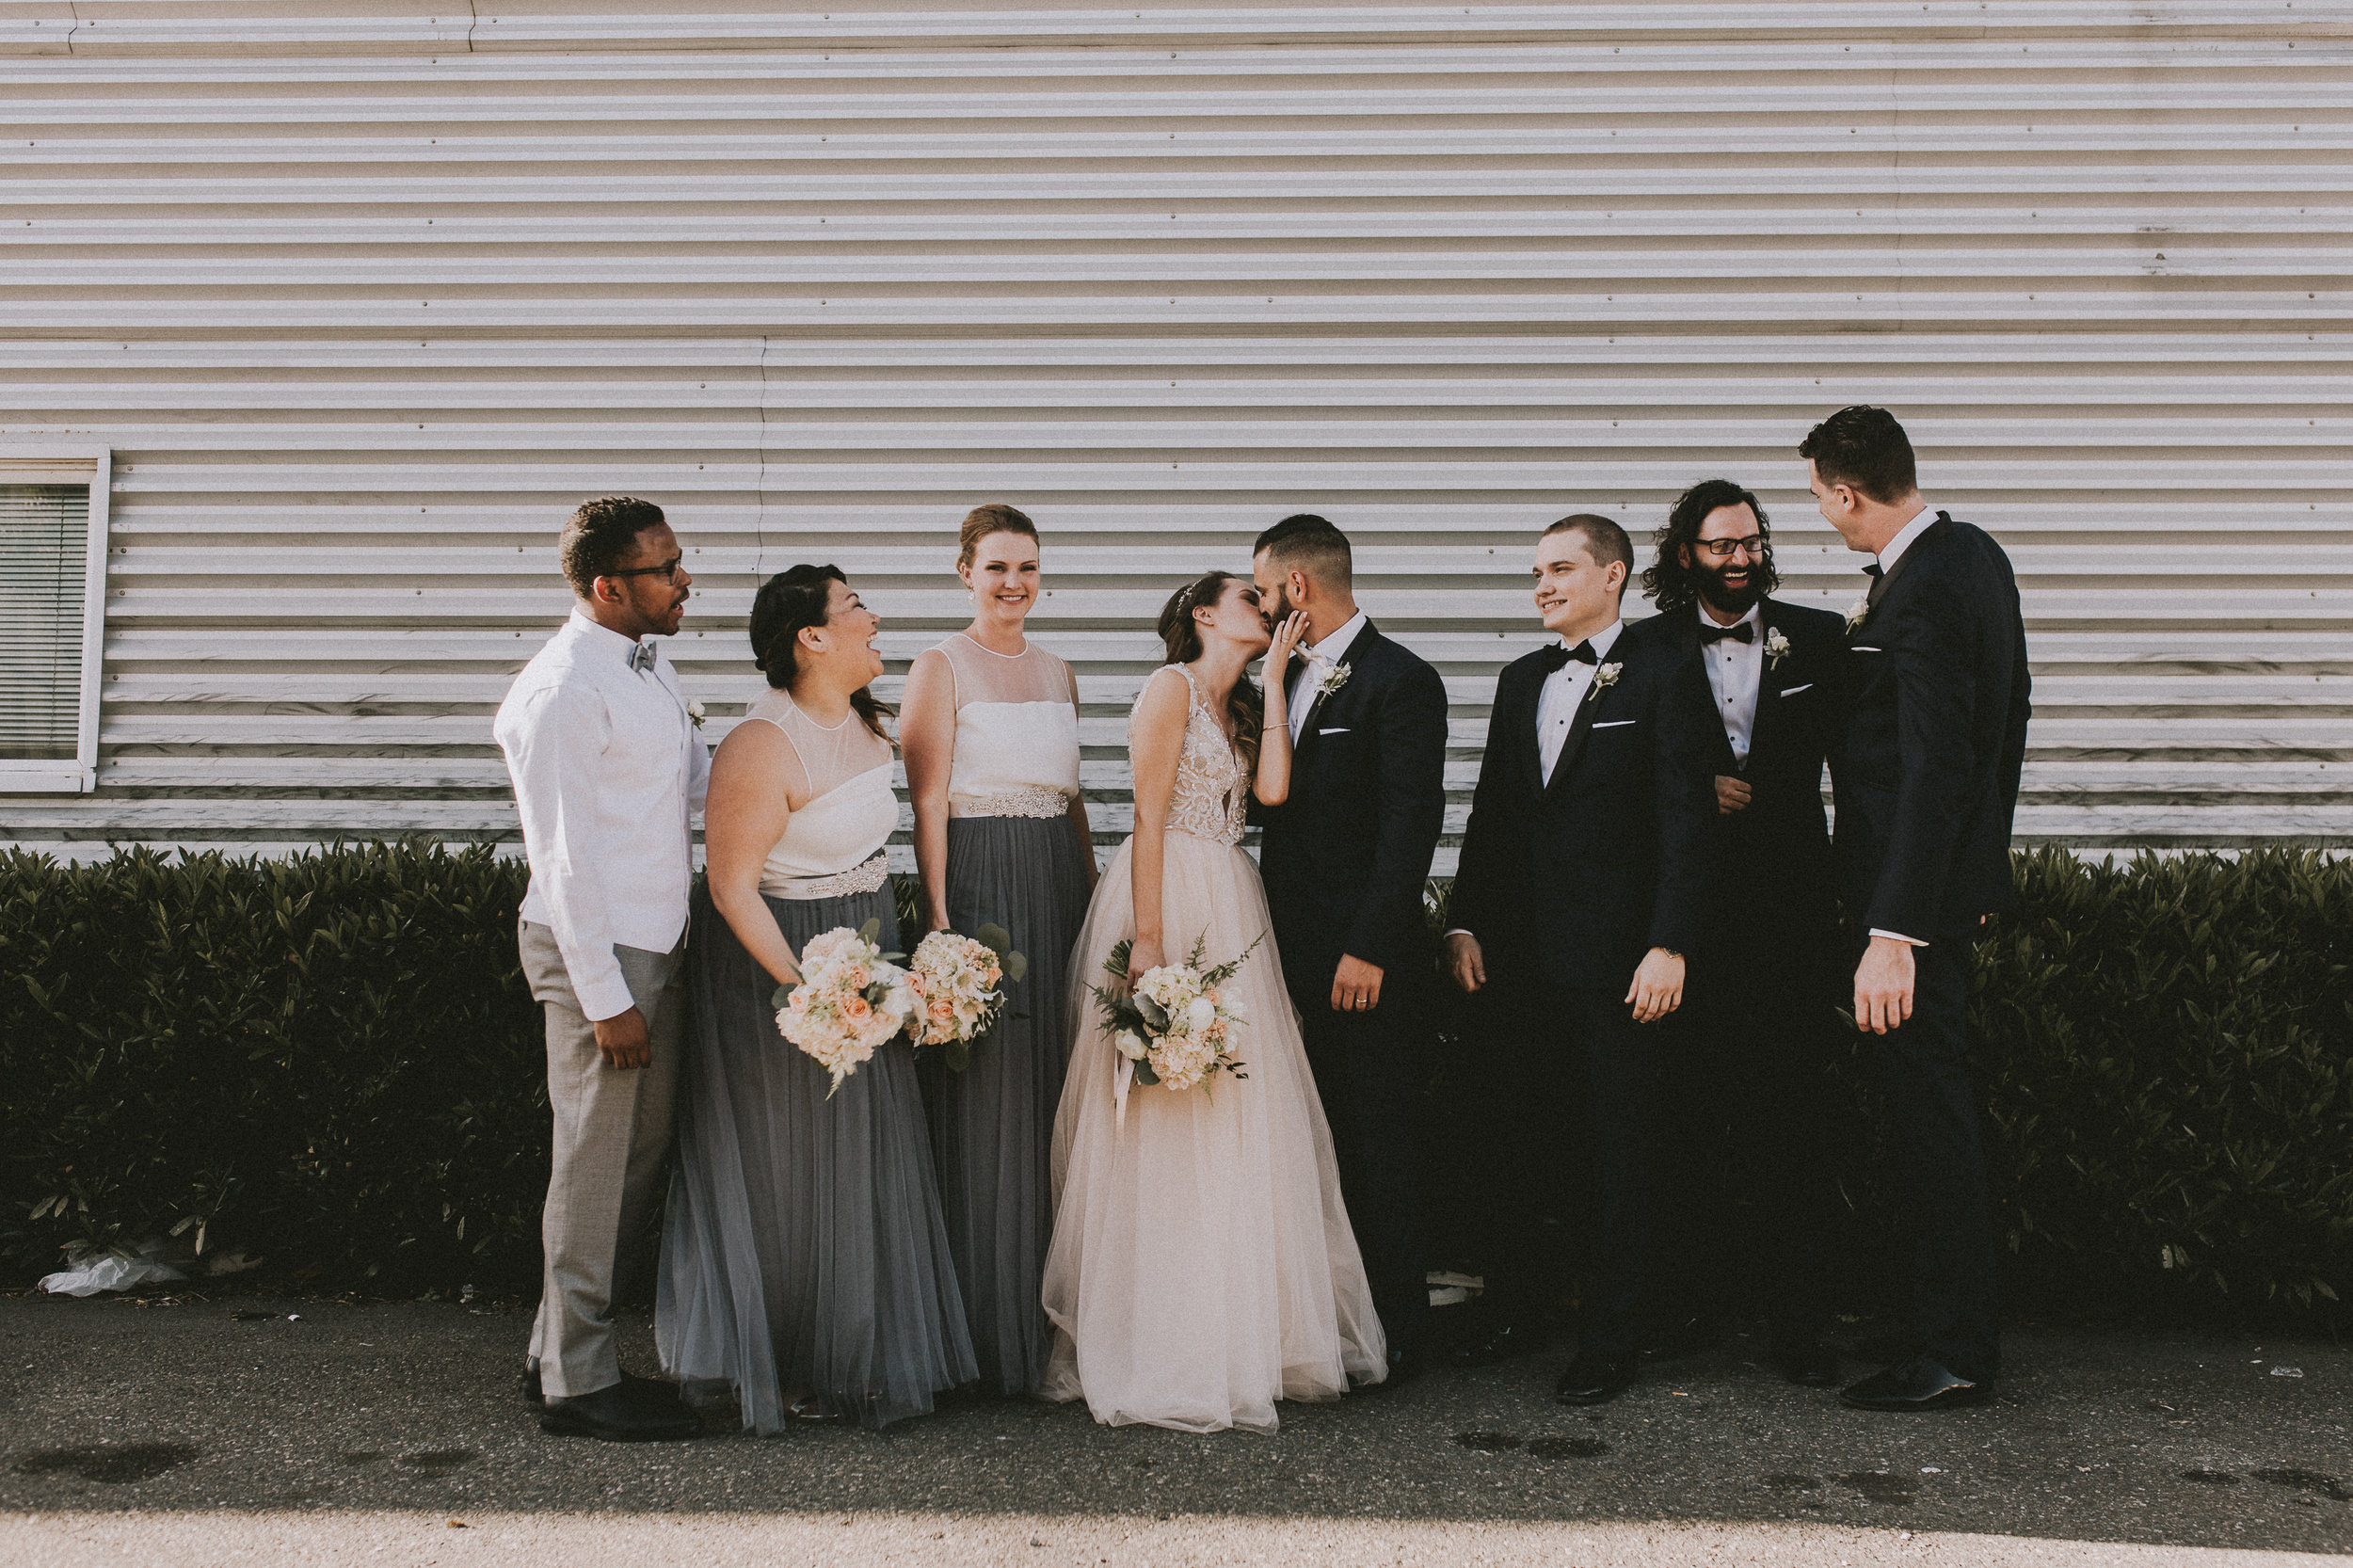 SAMLANDRETH-bridals-47.jpg